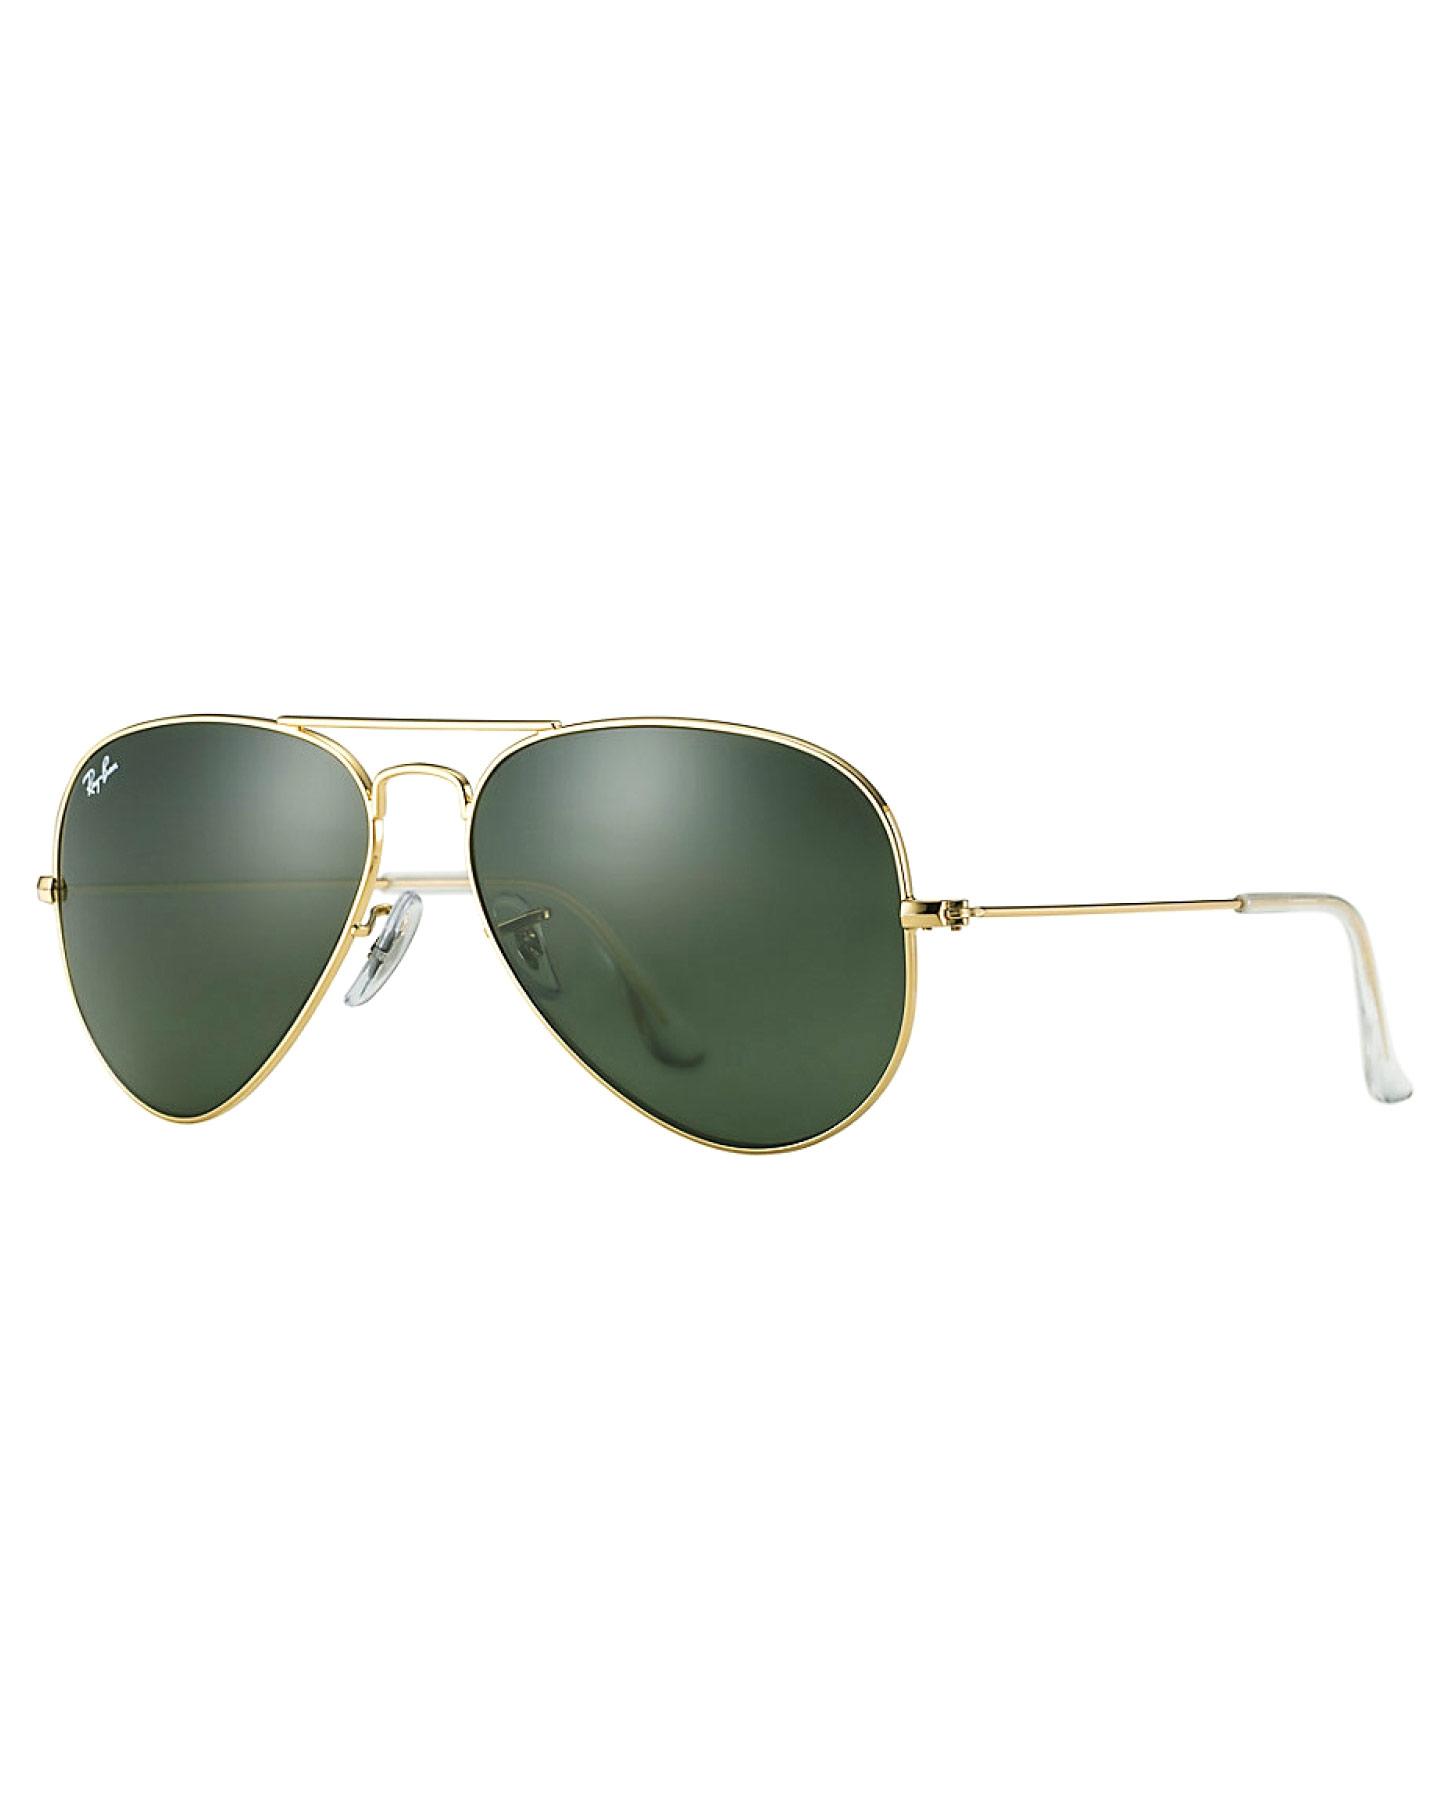 valentines-day-gifts-for-guys-rayban-aviator-classic-sunglasses-0215.jpg